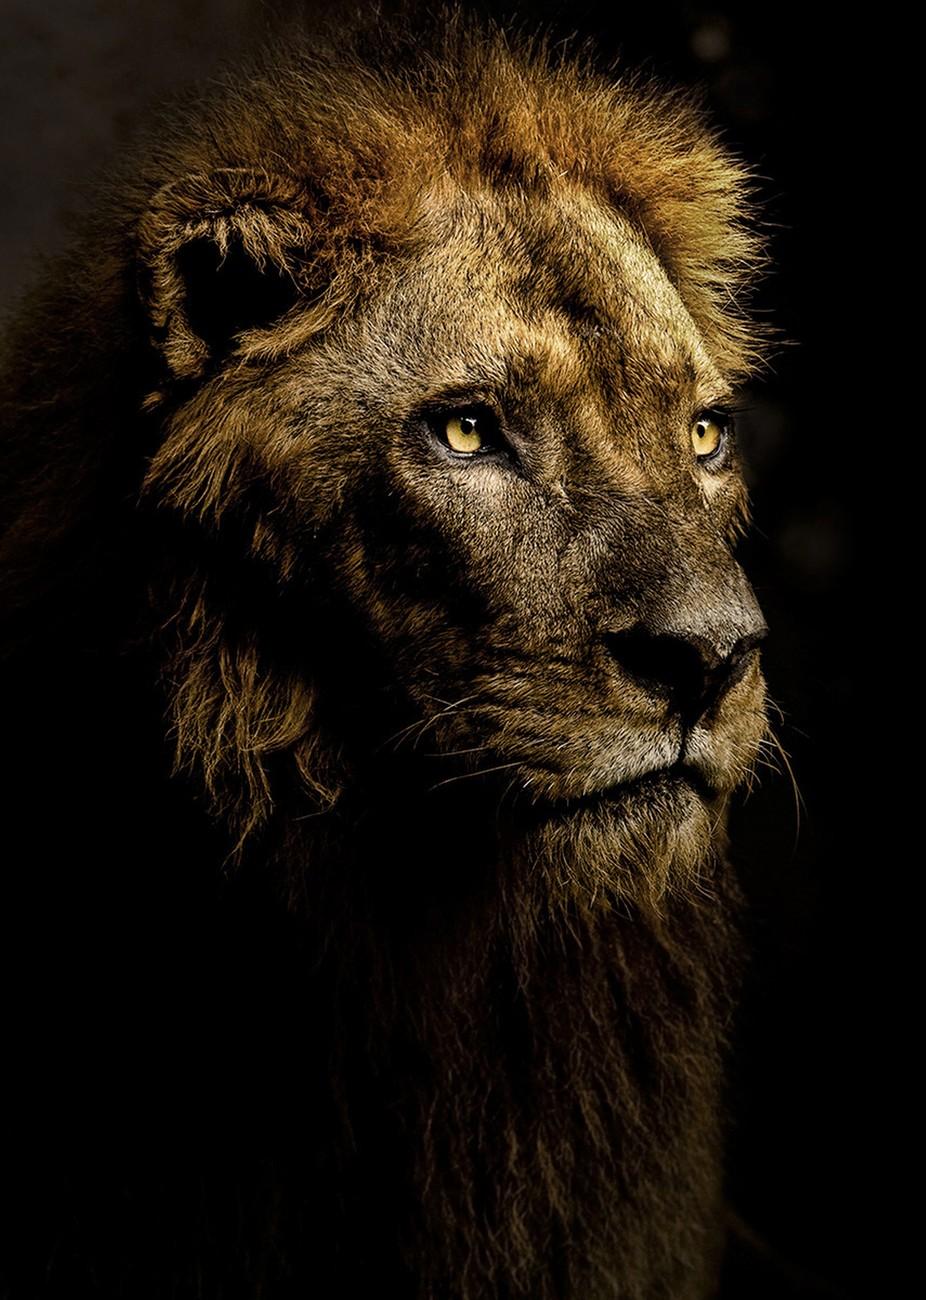 Lion in the Shadows by stephanieswartz - Wildlife Photo Contest 2017